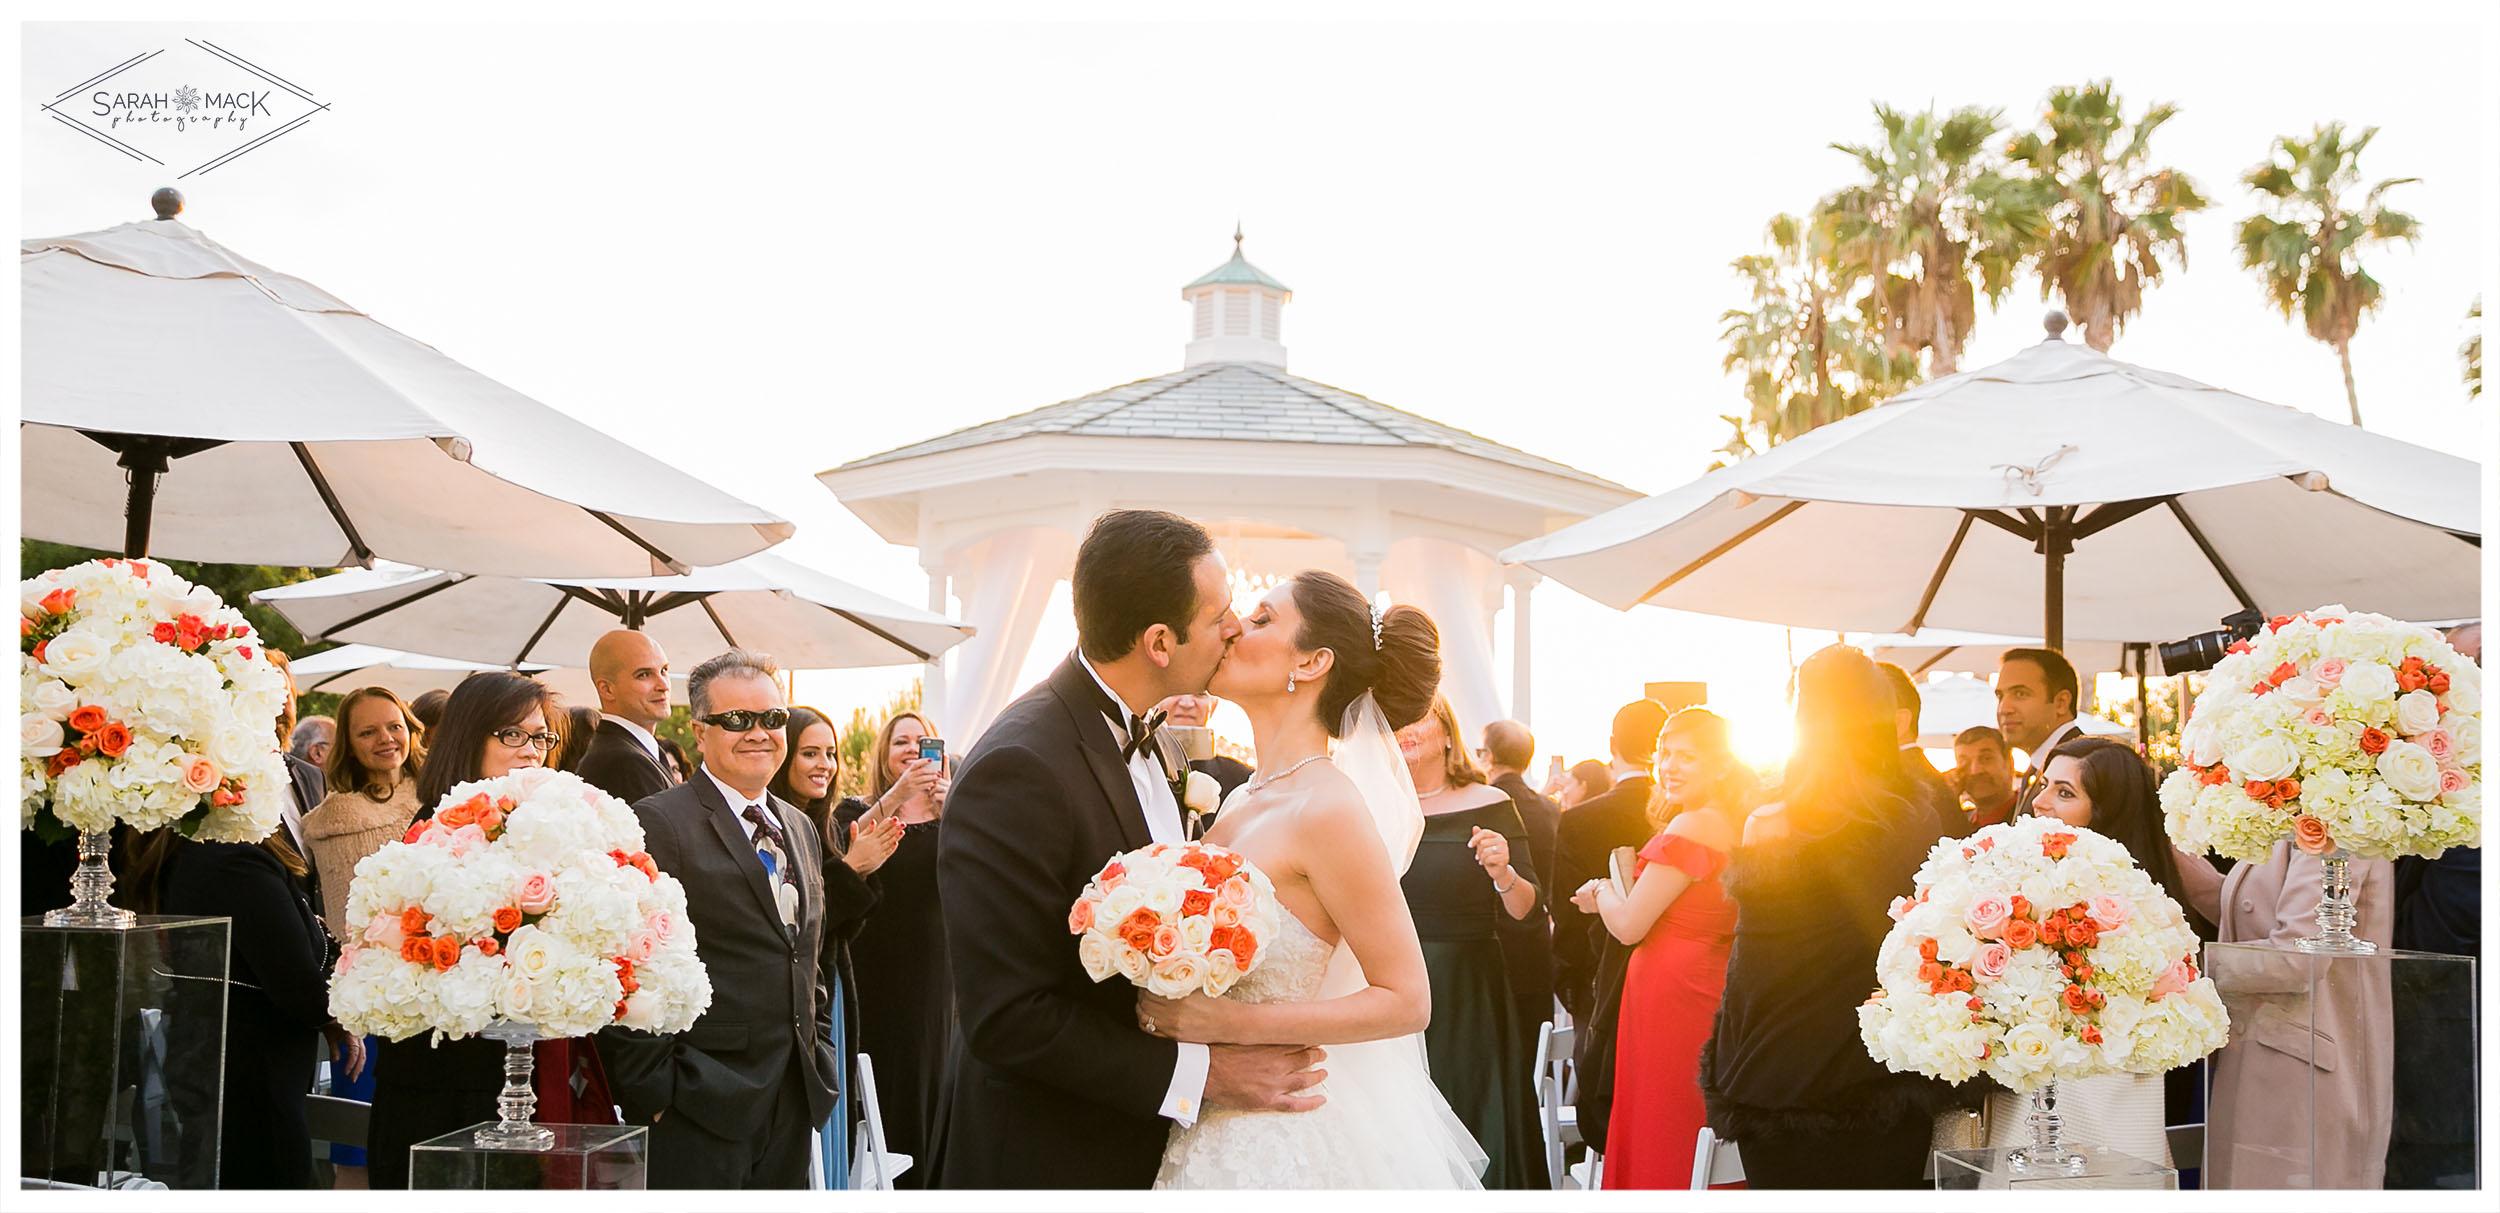 NJ-Newport-Beach-Marriott-Persian-Wedding-32.jpg